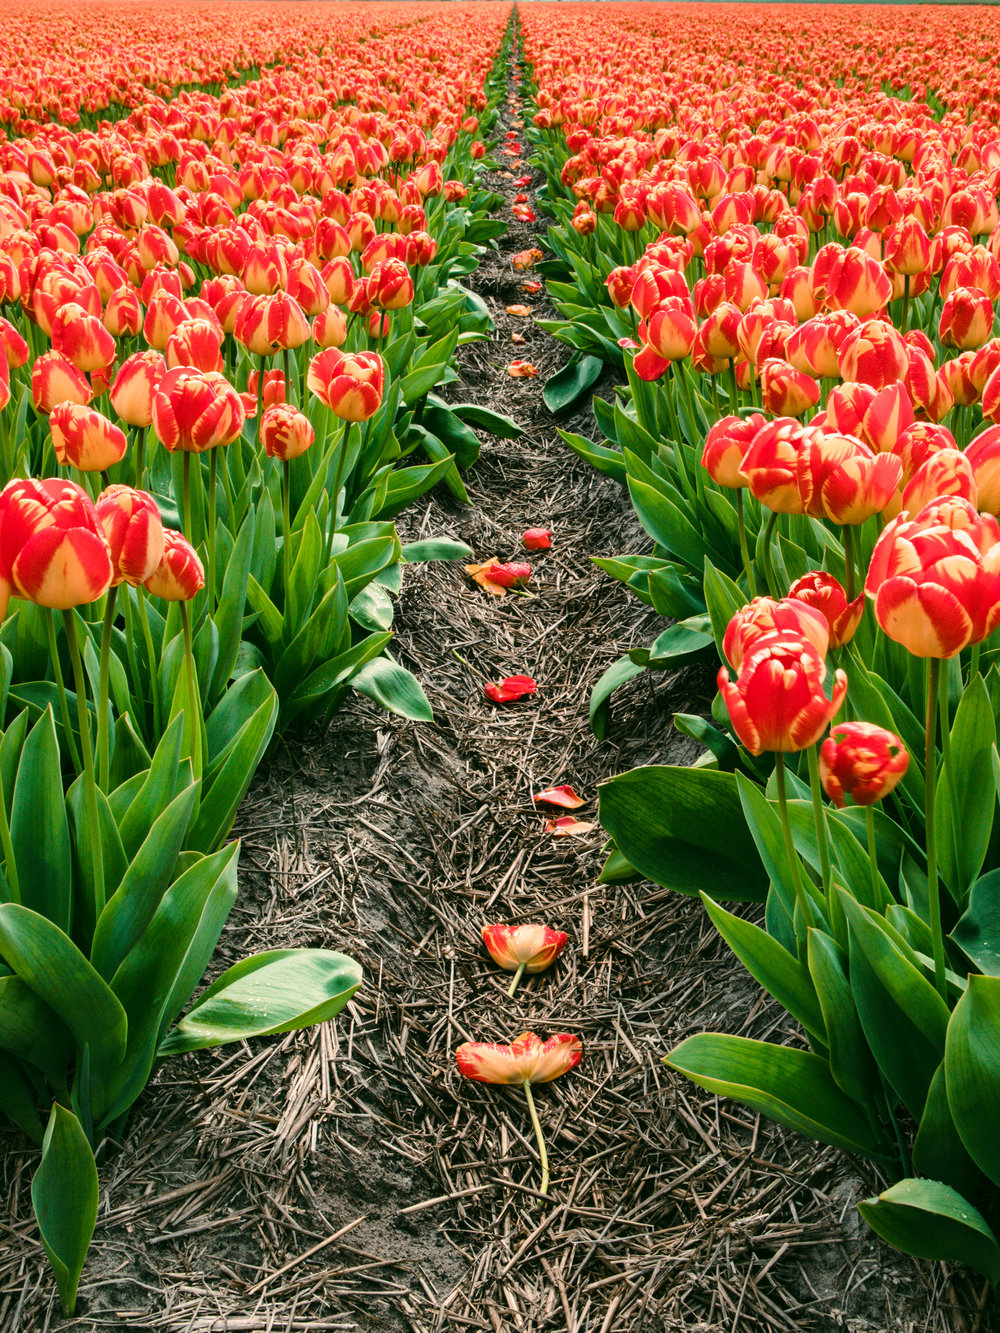 Lily-Heaton-Tulips-2018-19.jpg